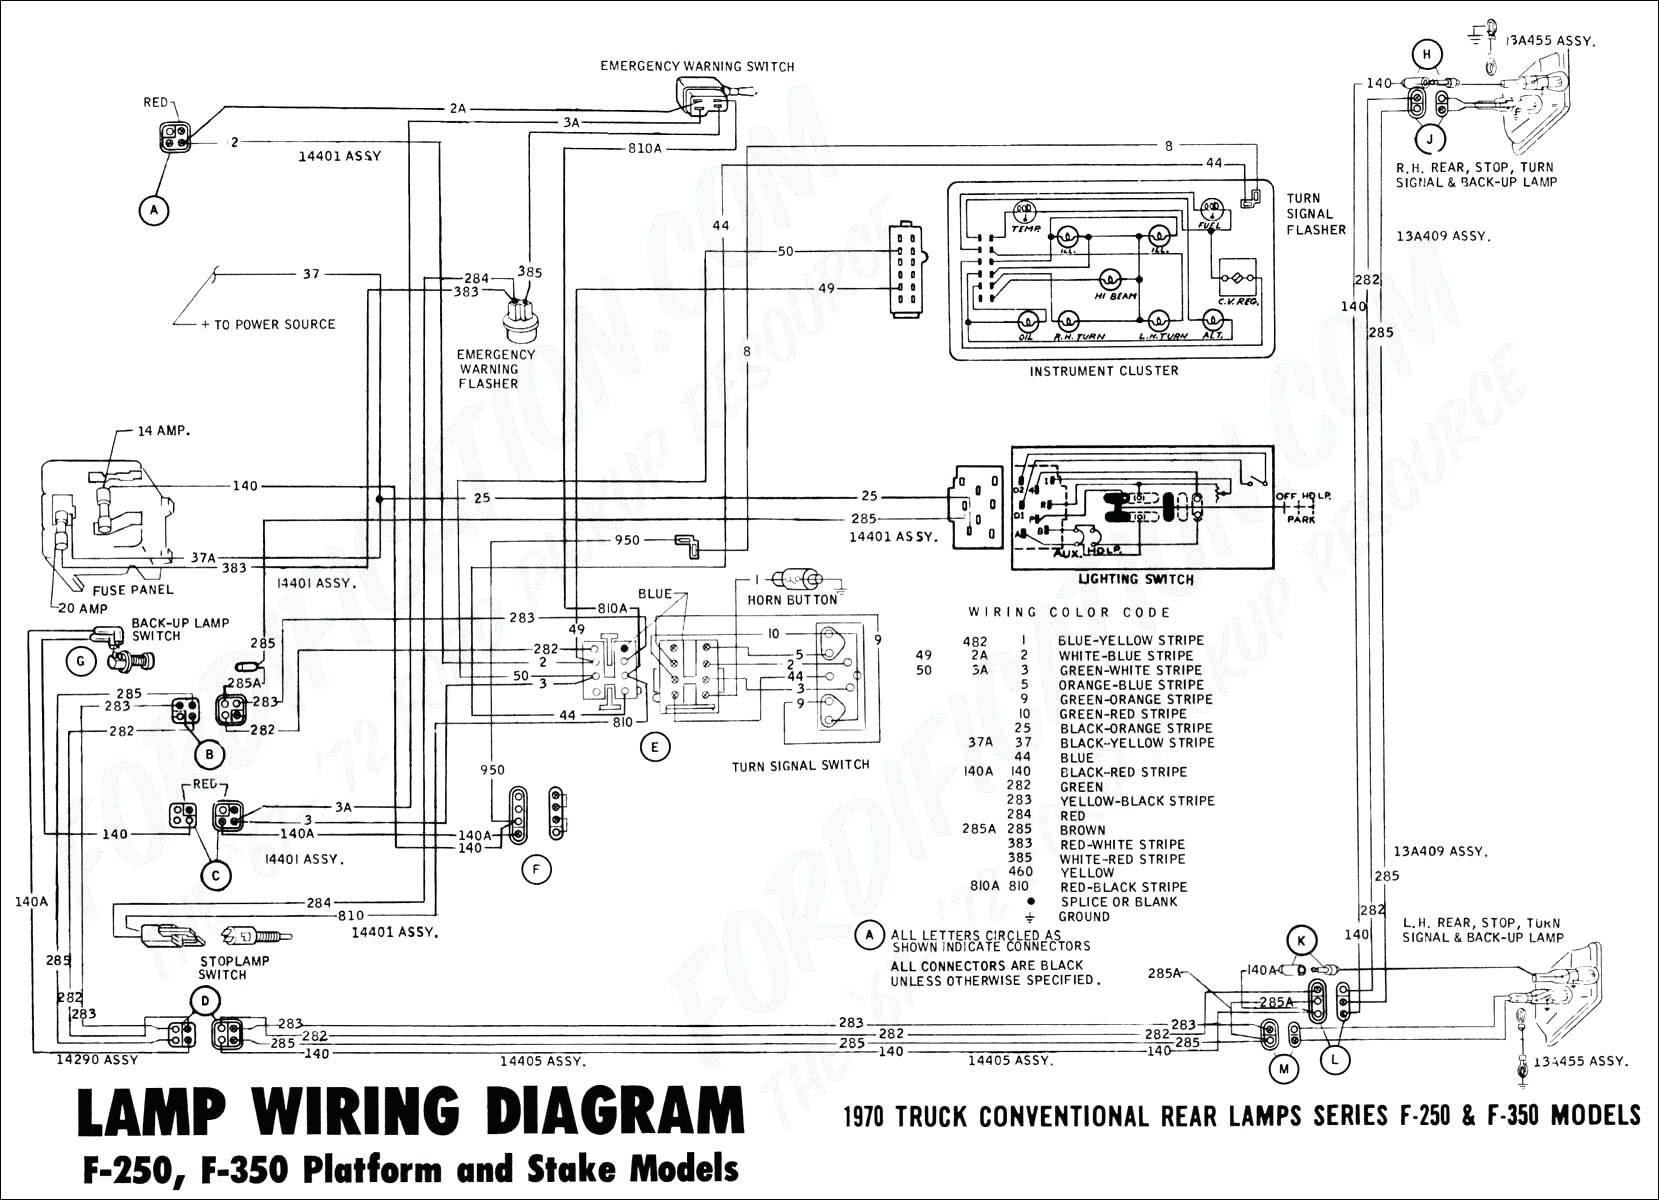 2005 Chevy Truck Wiring Diagram